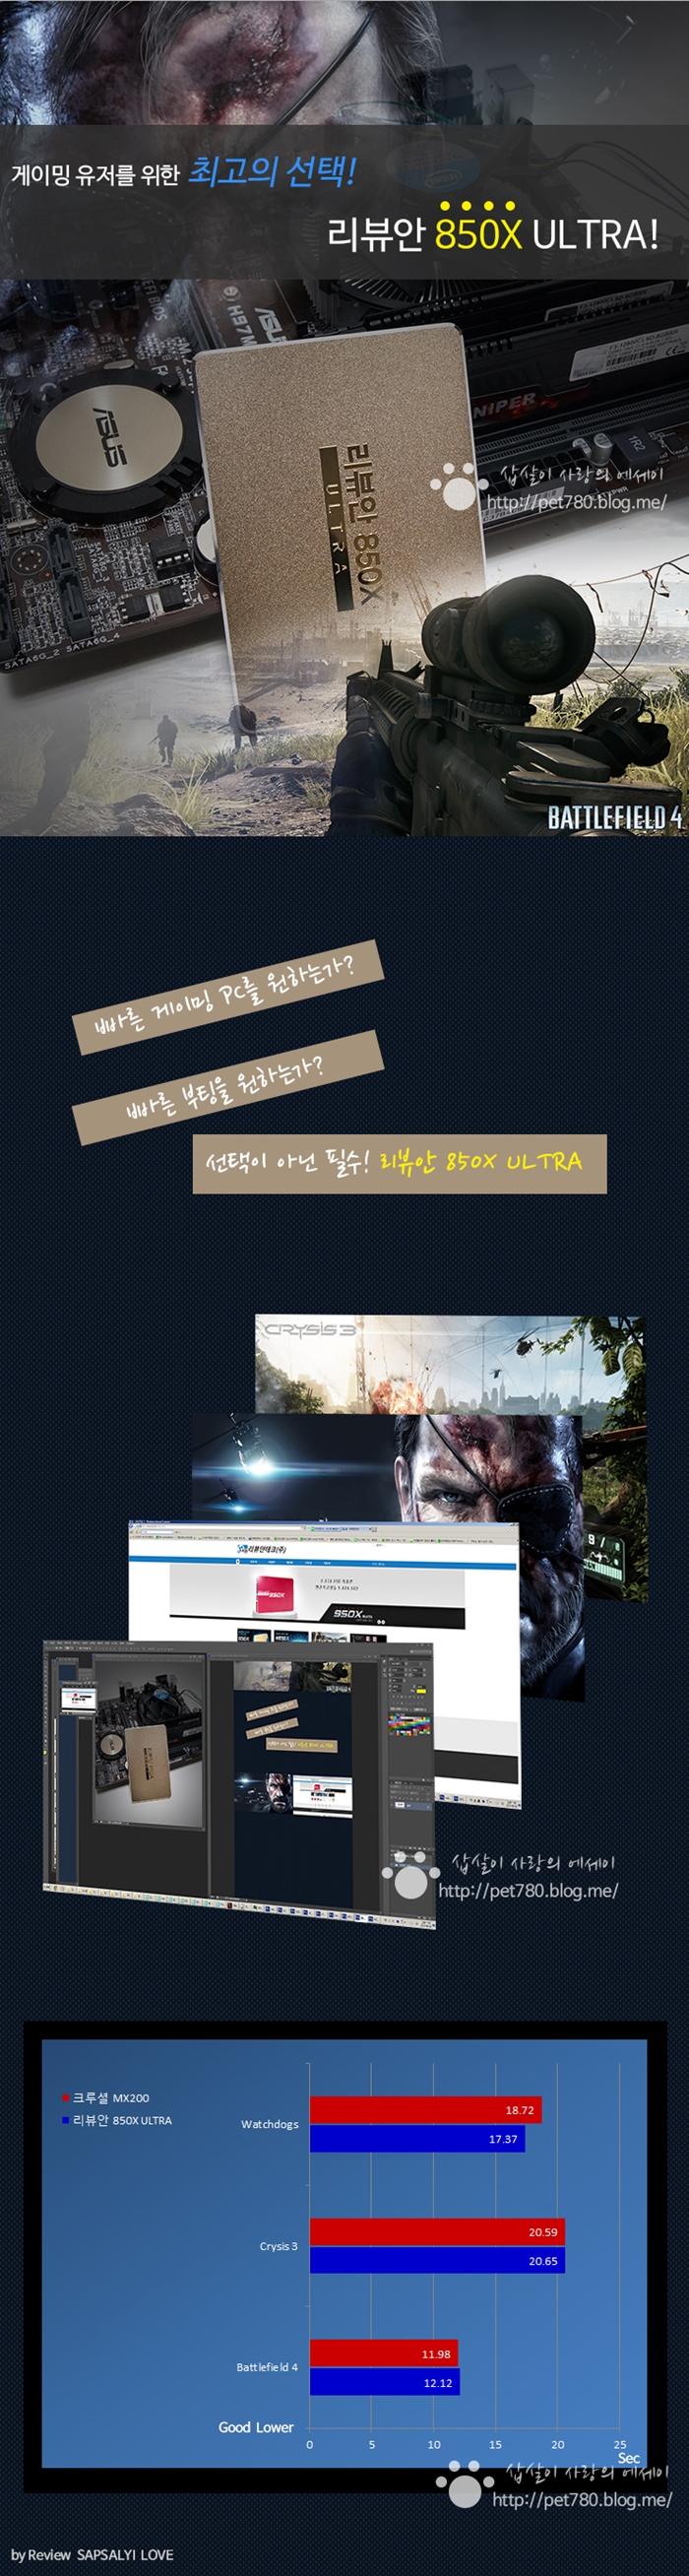 ����� 850X ULTRA (��Ʈ��) ����4 SLC ���� �÷��� SSD ��õ.jpg